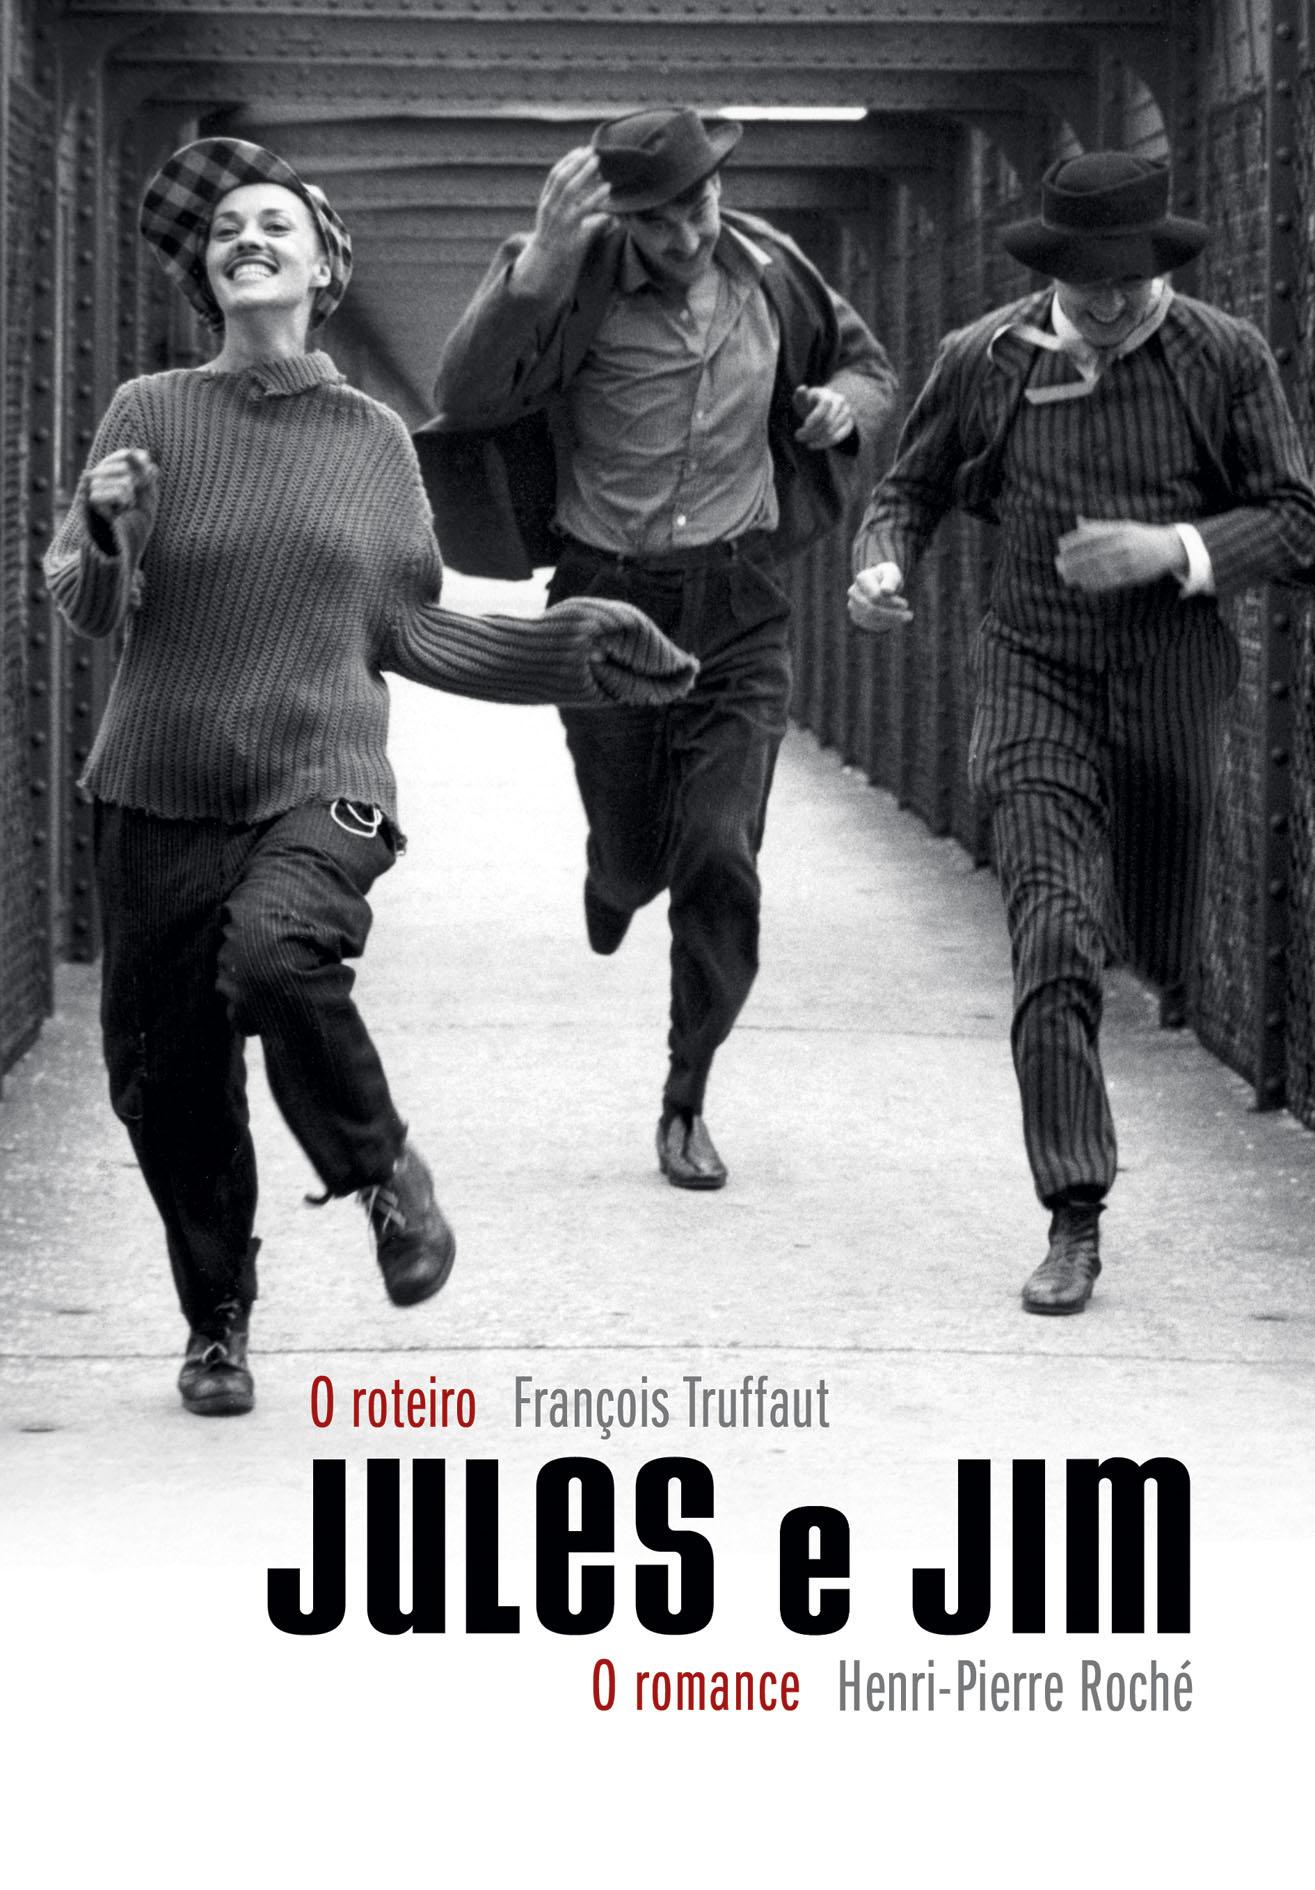 Žana Moro (Jeanne Moreau) Jules-e-jim